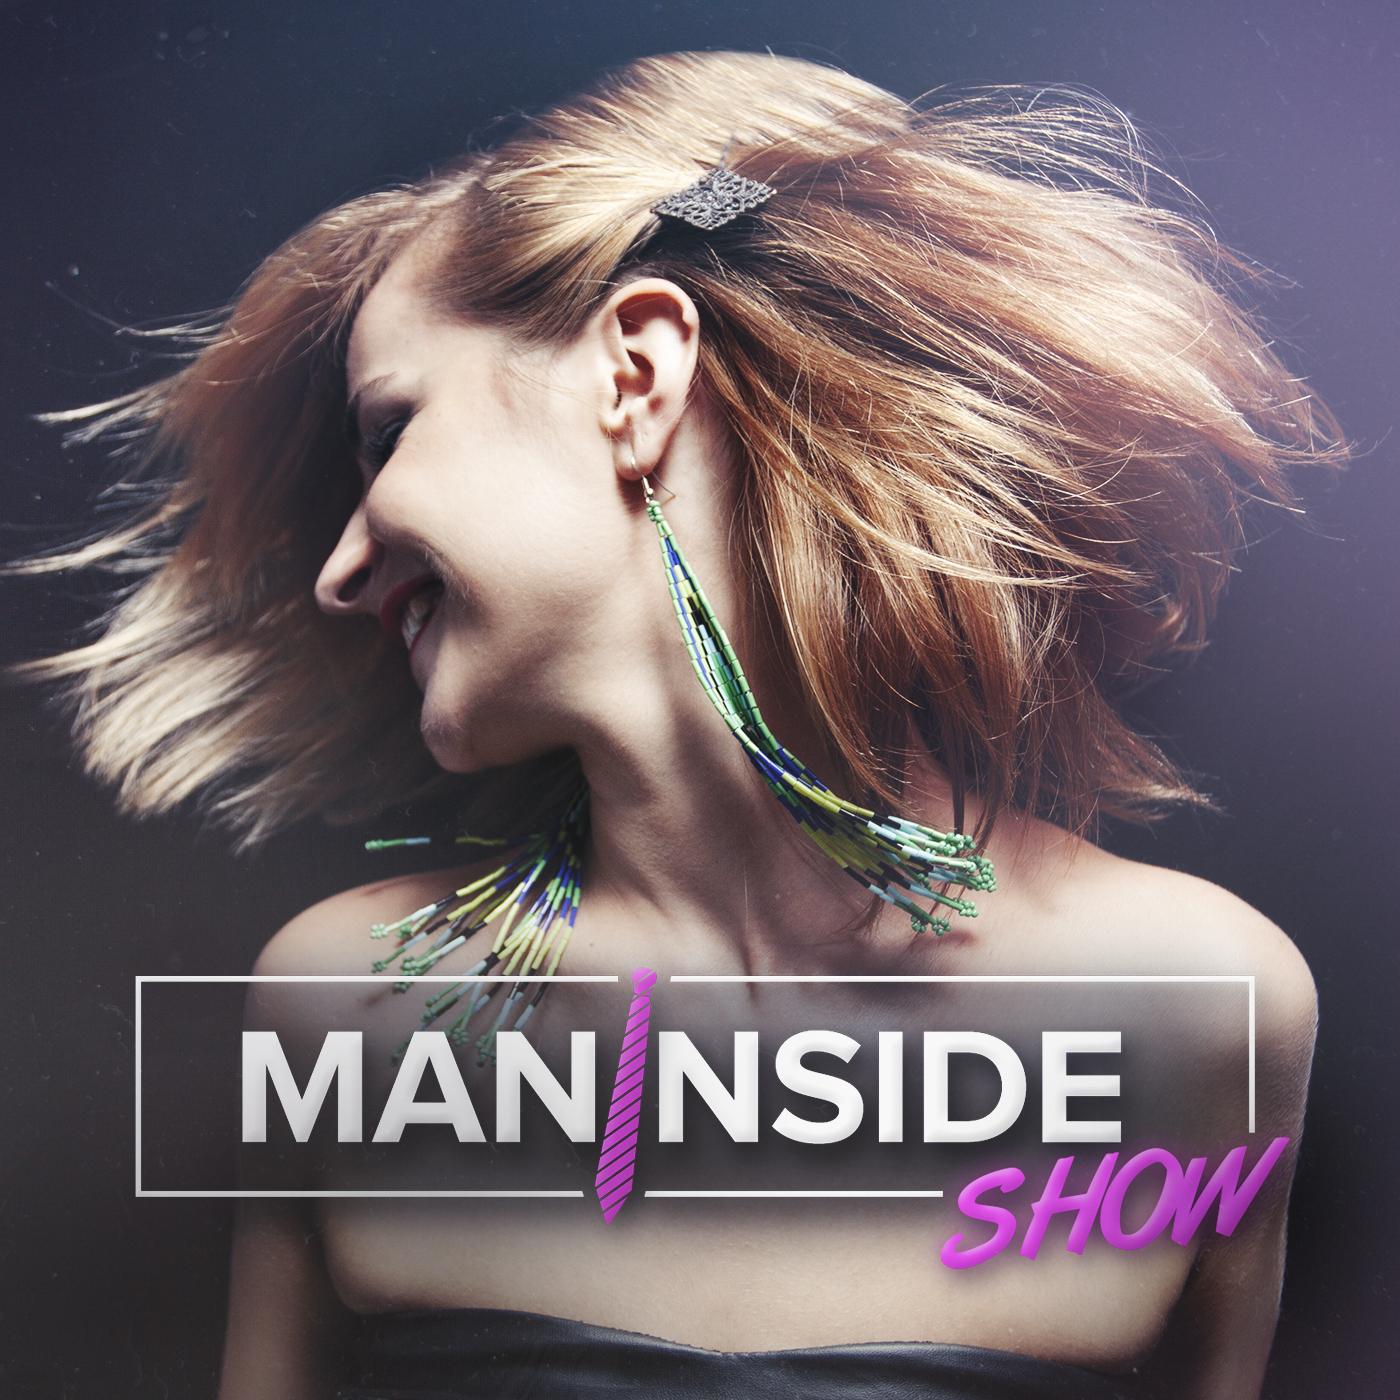 ManInside Show